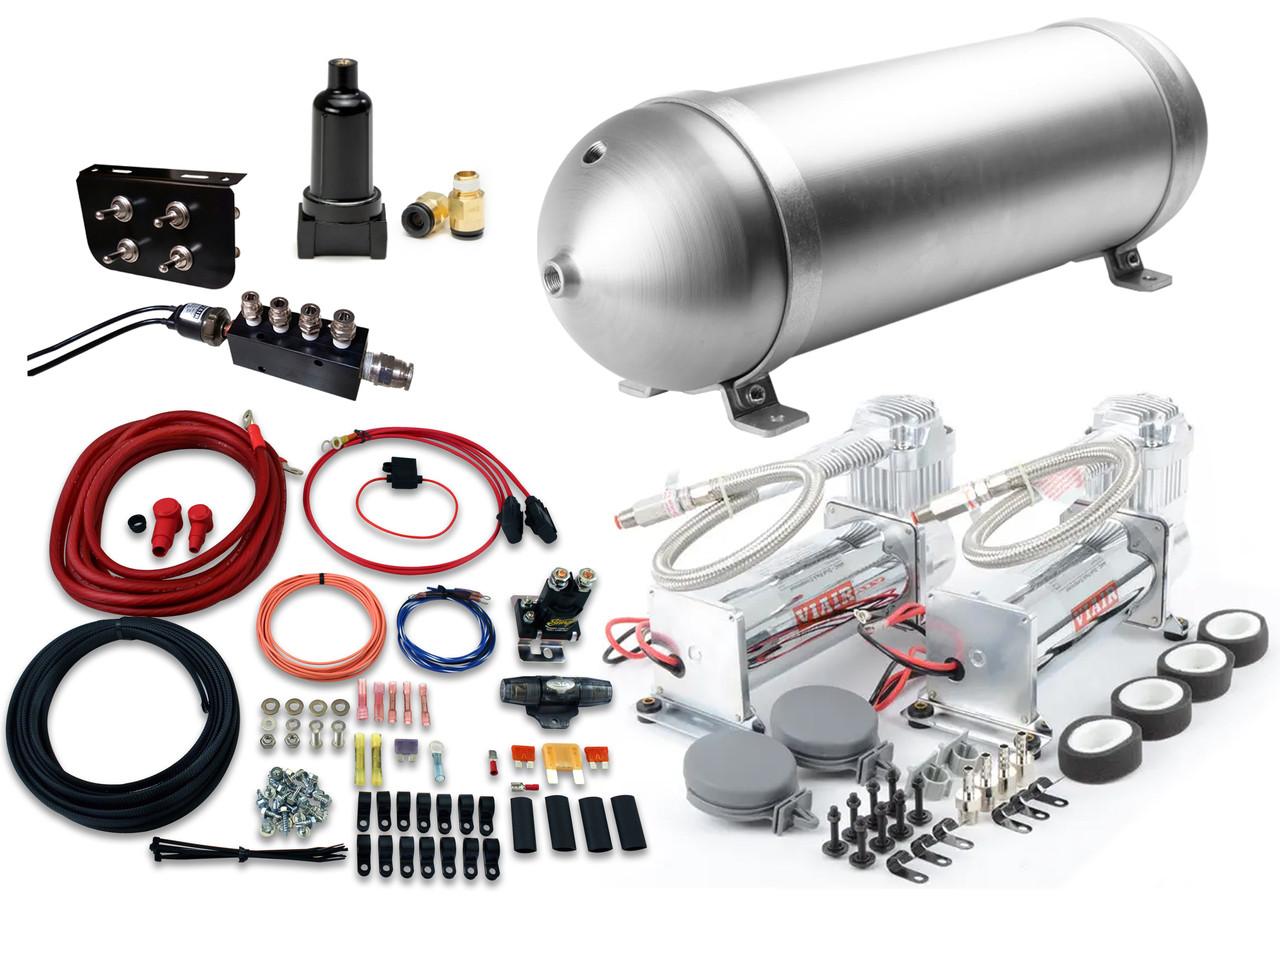 Manual Valve Air Management Kit on